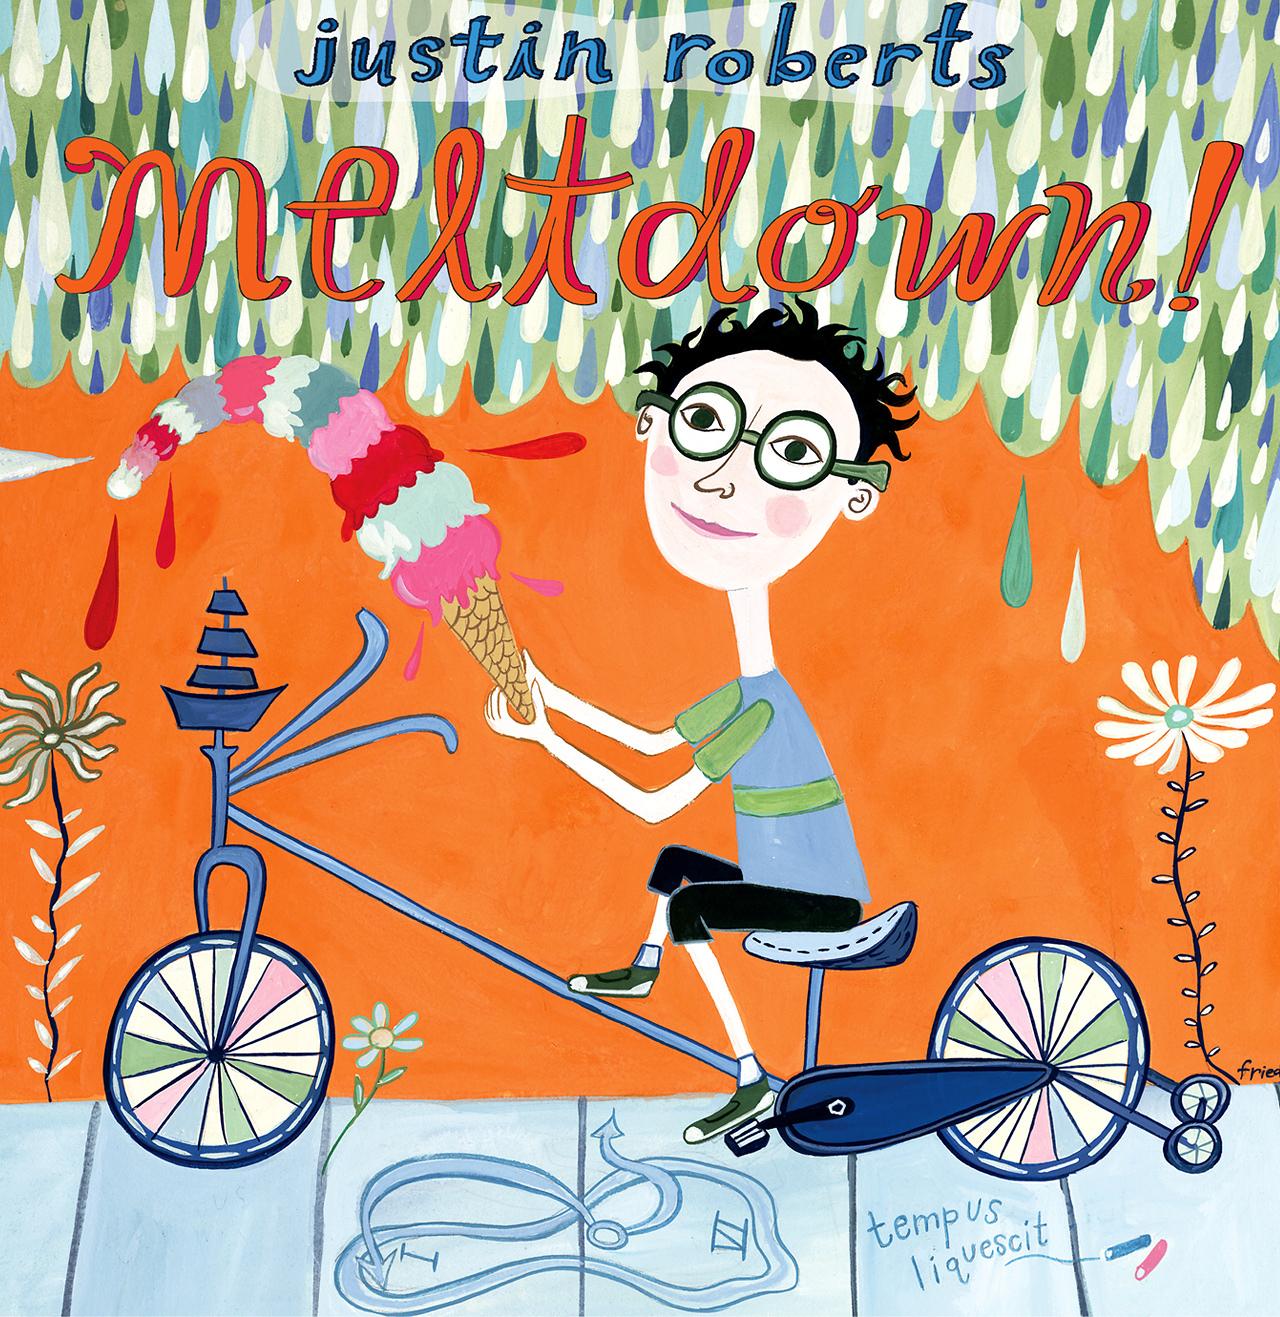 Meltdown CD by Justin Roberts